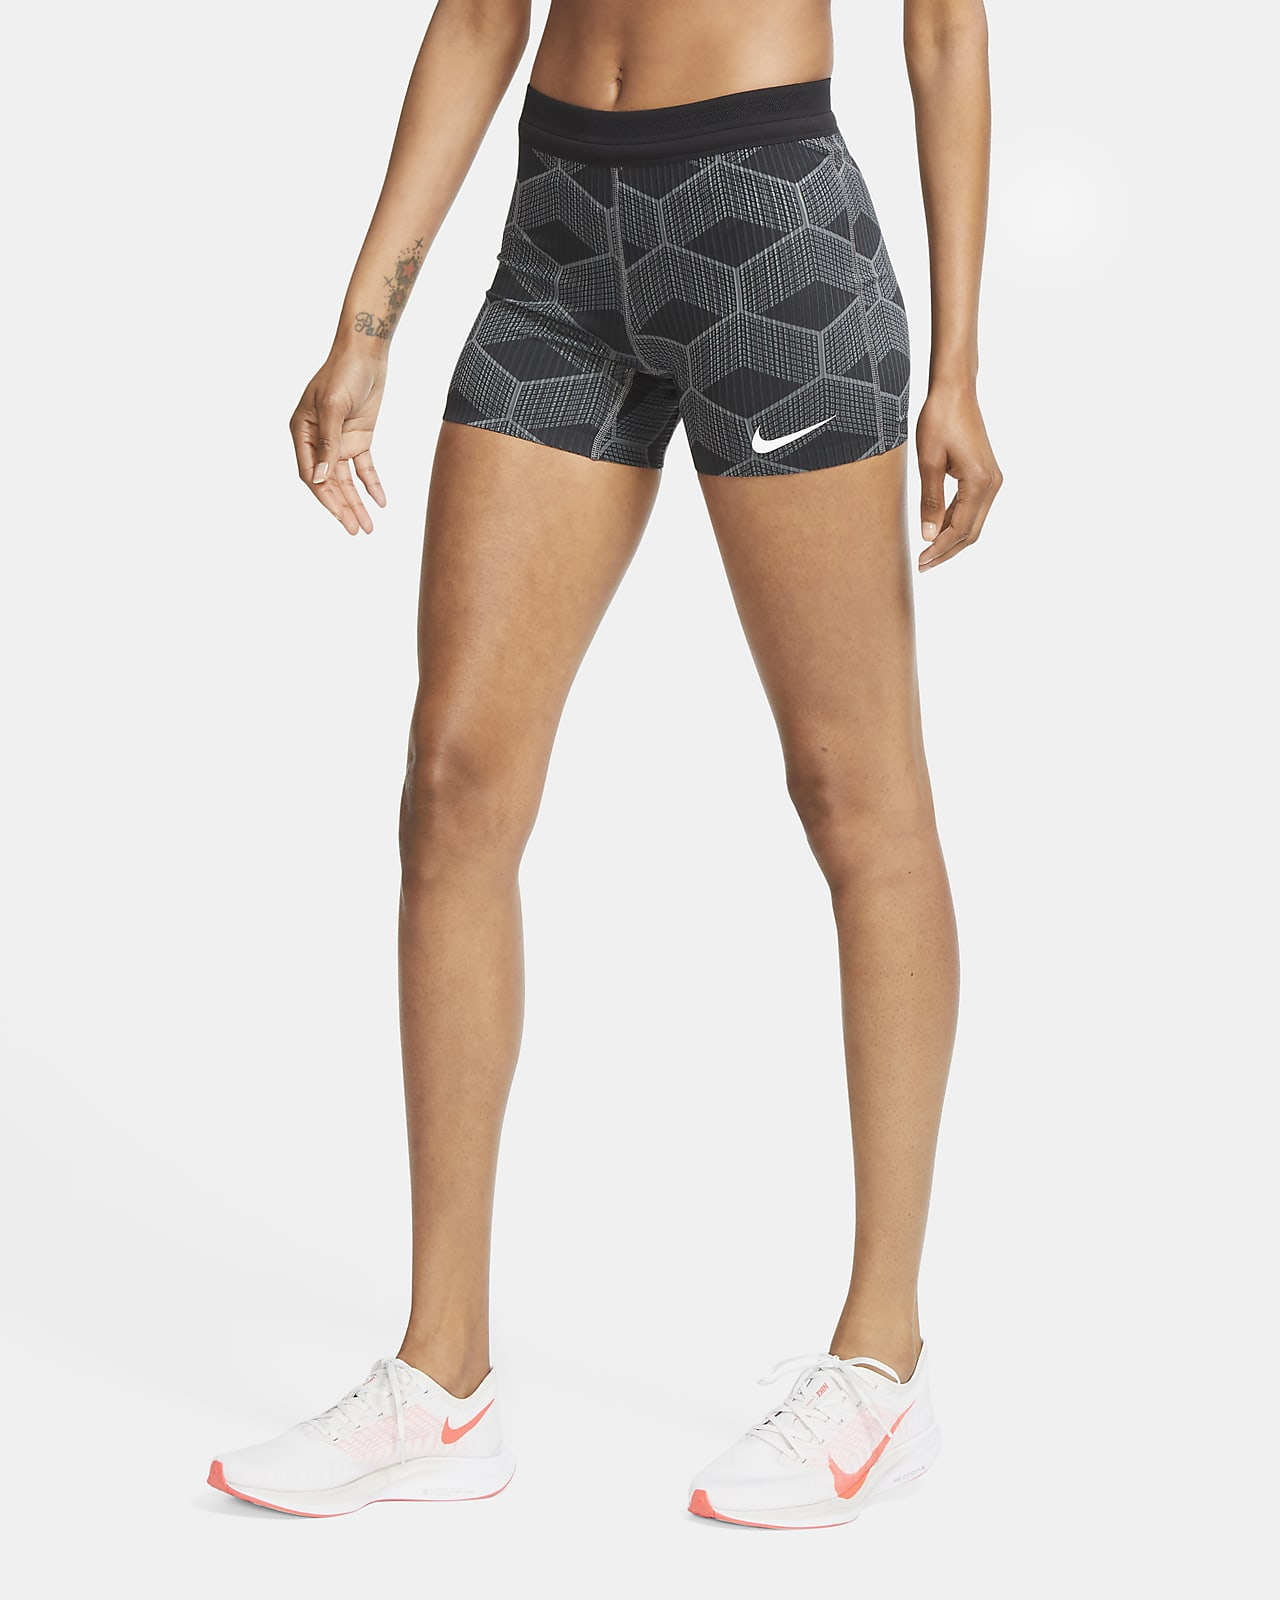 Shorts aderenti da running Nike Dri-FIT ADV Team Kenya AeroSwift - Donna